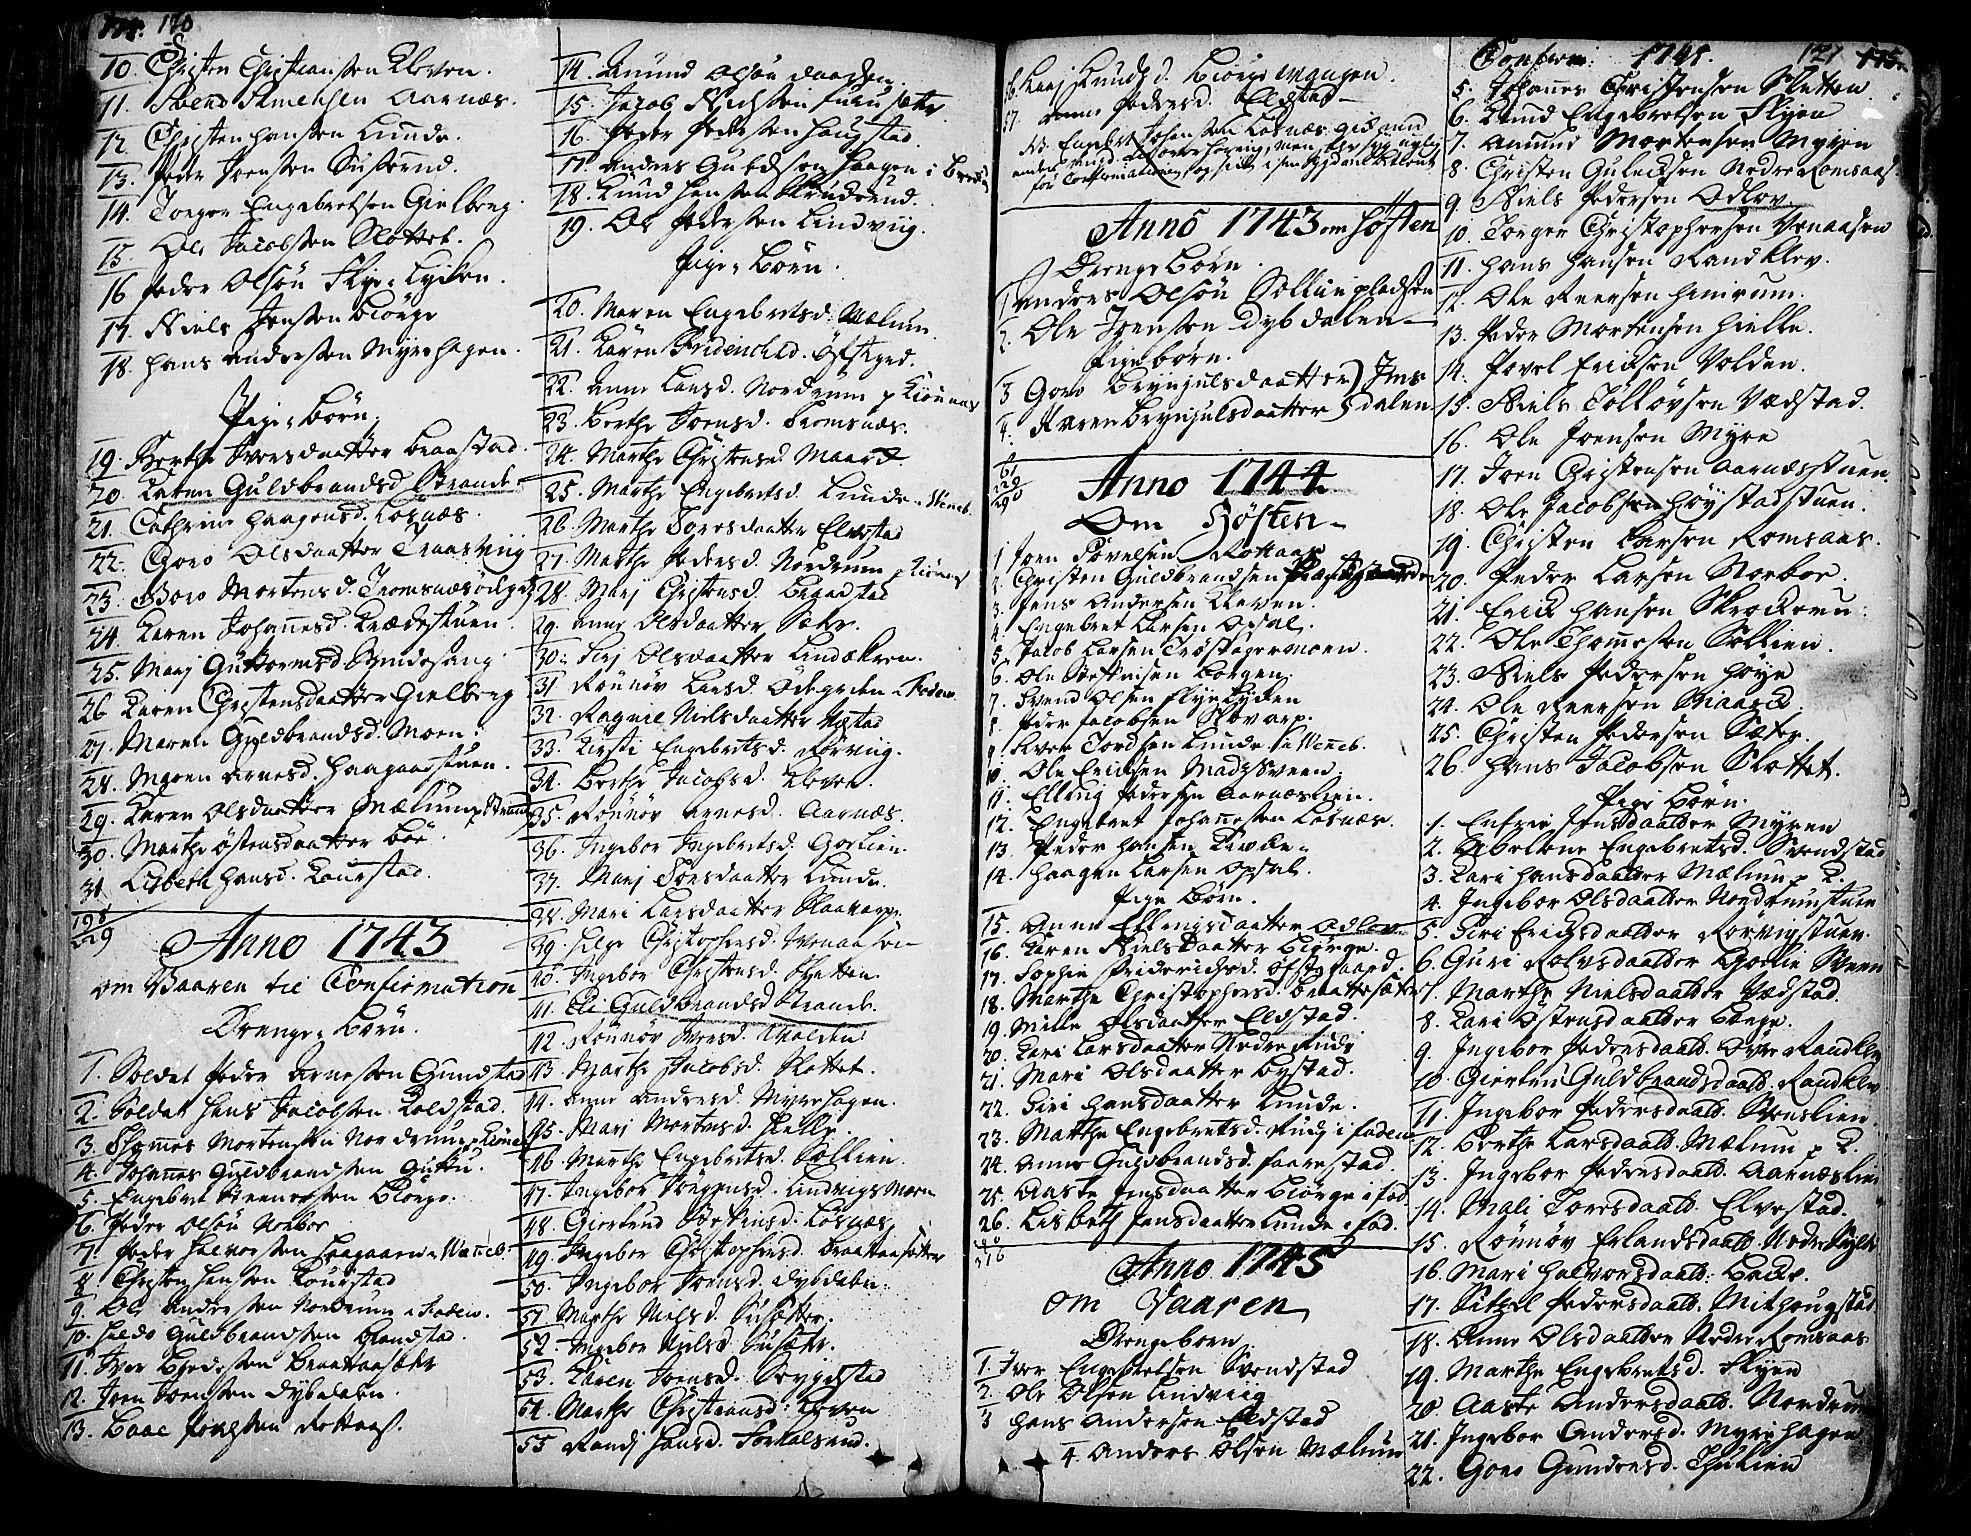 SAH, Ringebu prestekontor, Ministerialbok nr. 2, 1734-1780, s. 170-171